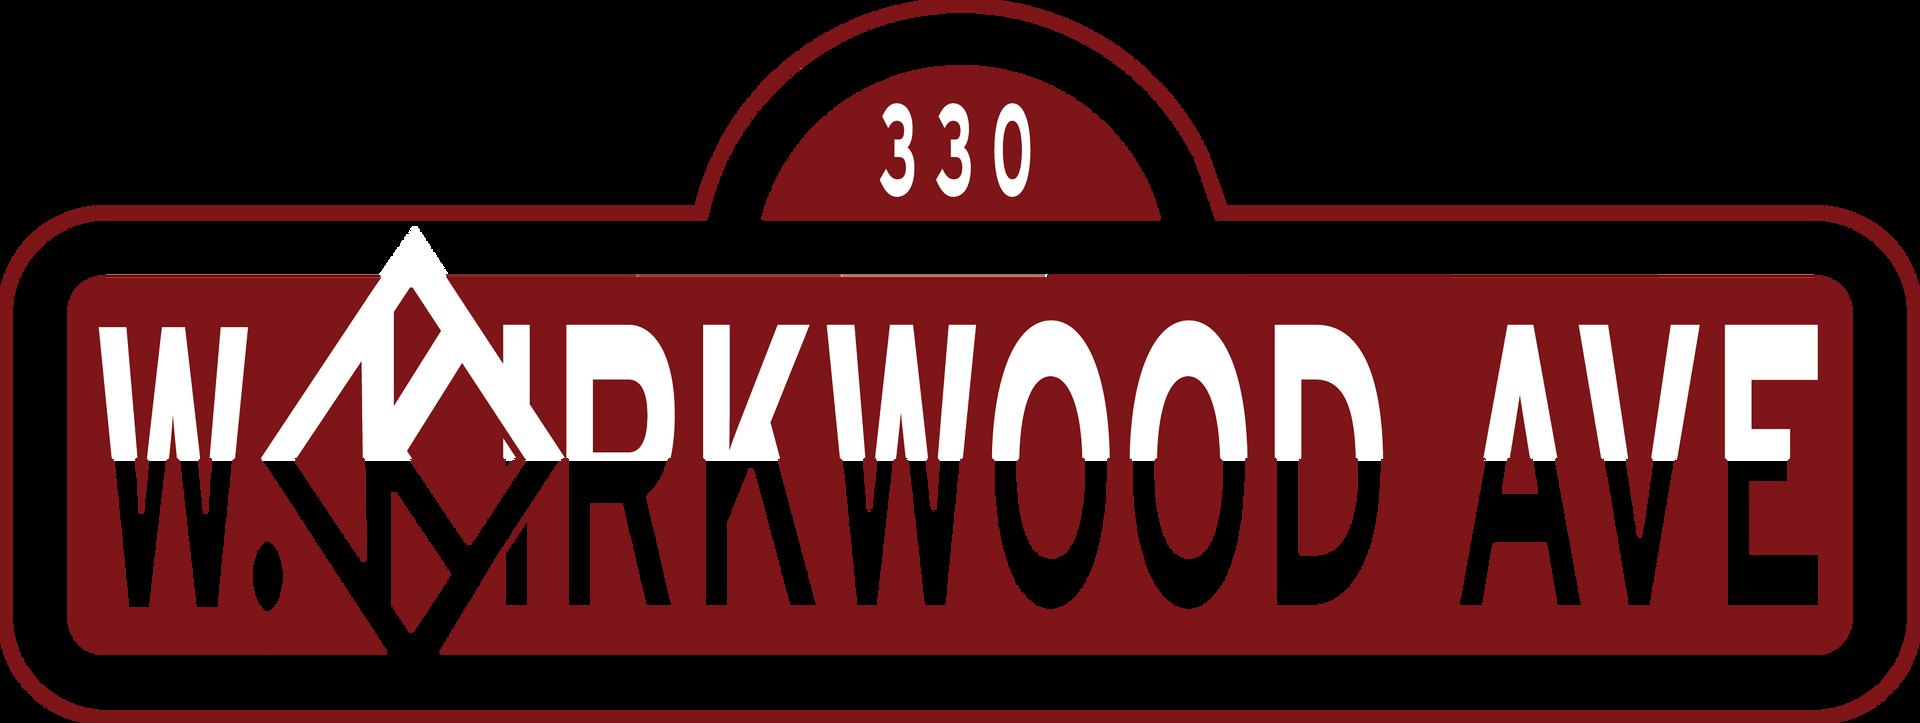 W-KRKWOOD AVE 2.png